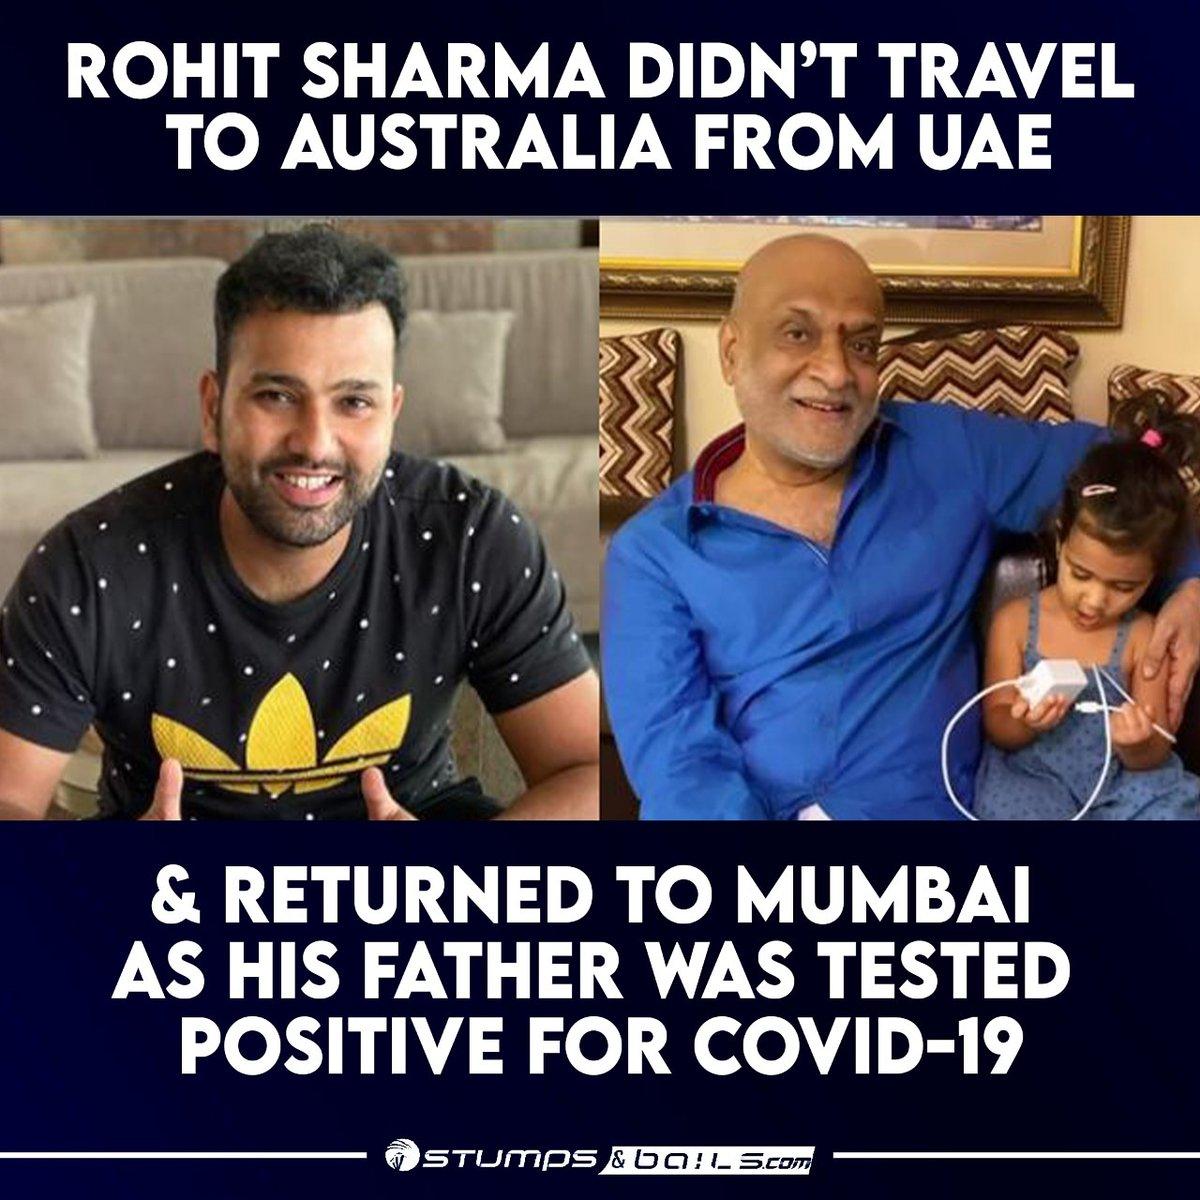 @ImRo45 travelled to #Mumbai from UAE  Follow us @stumpnbails #Covid_19 #COVID19 #RohitSharma #MumbaiIndians #MI #UAE #Australia #Indiancricketer #IndianCricketTeam #Cricket #Cricketnews #Cricketupdates